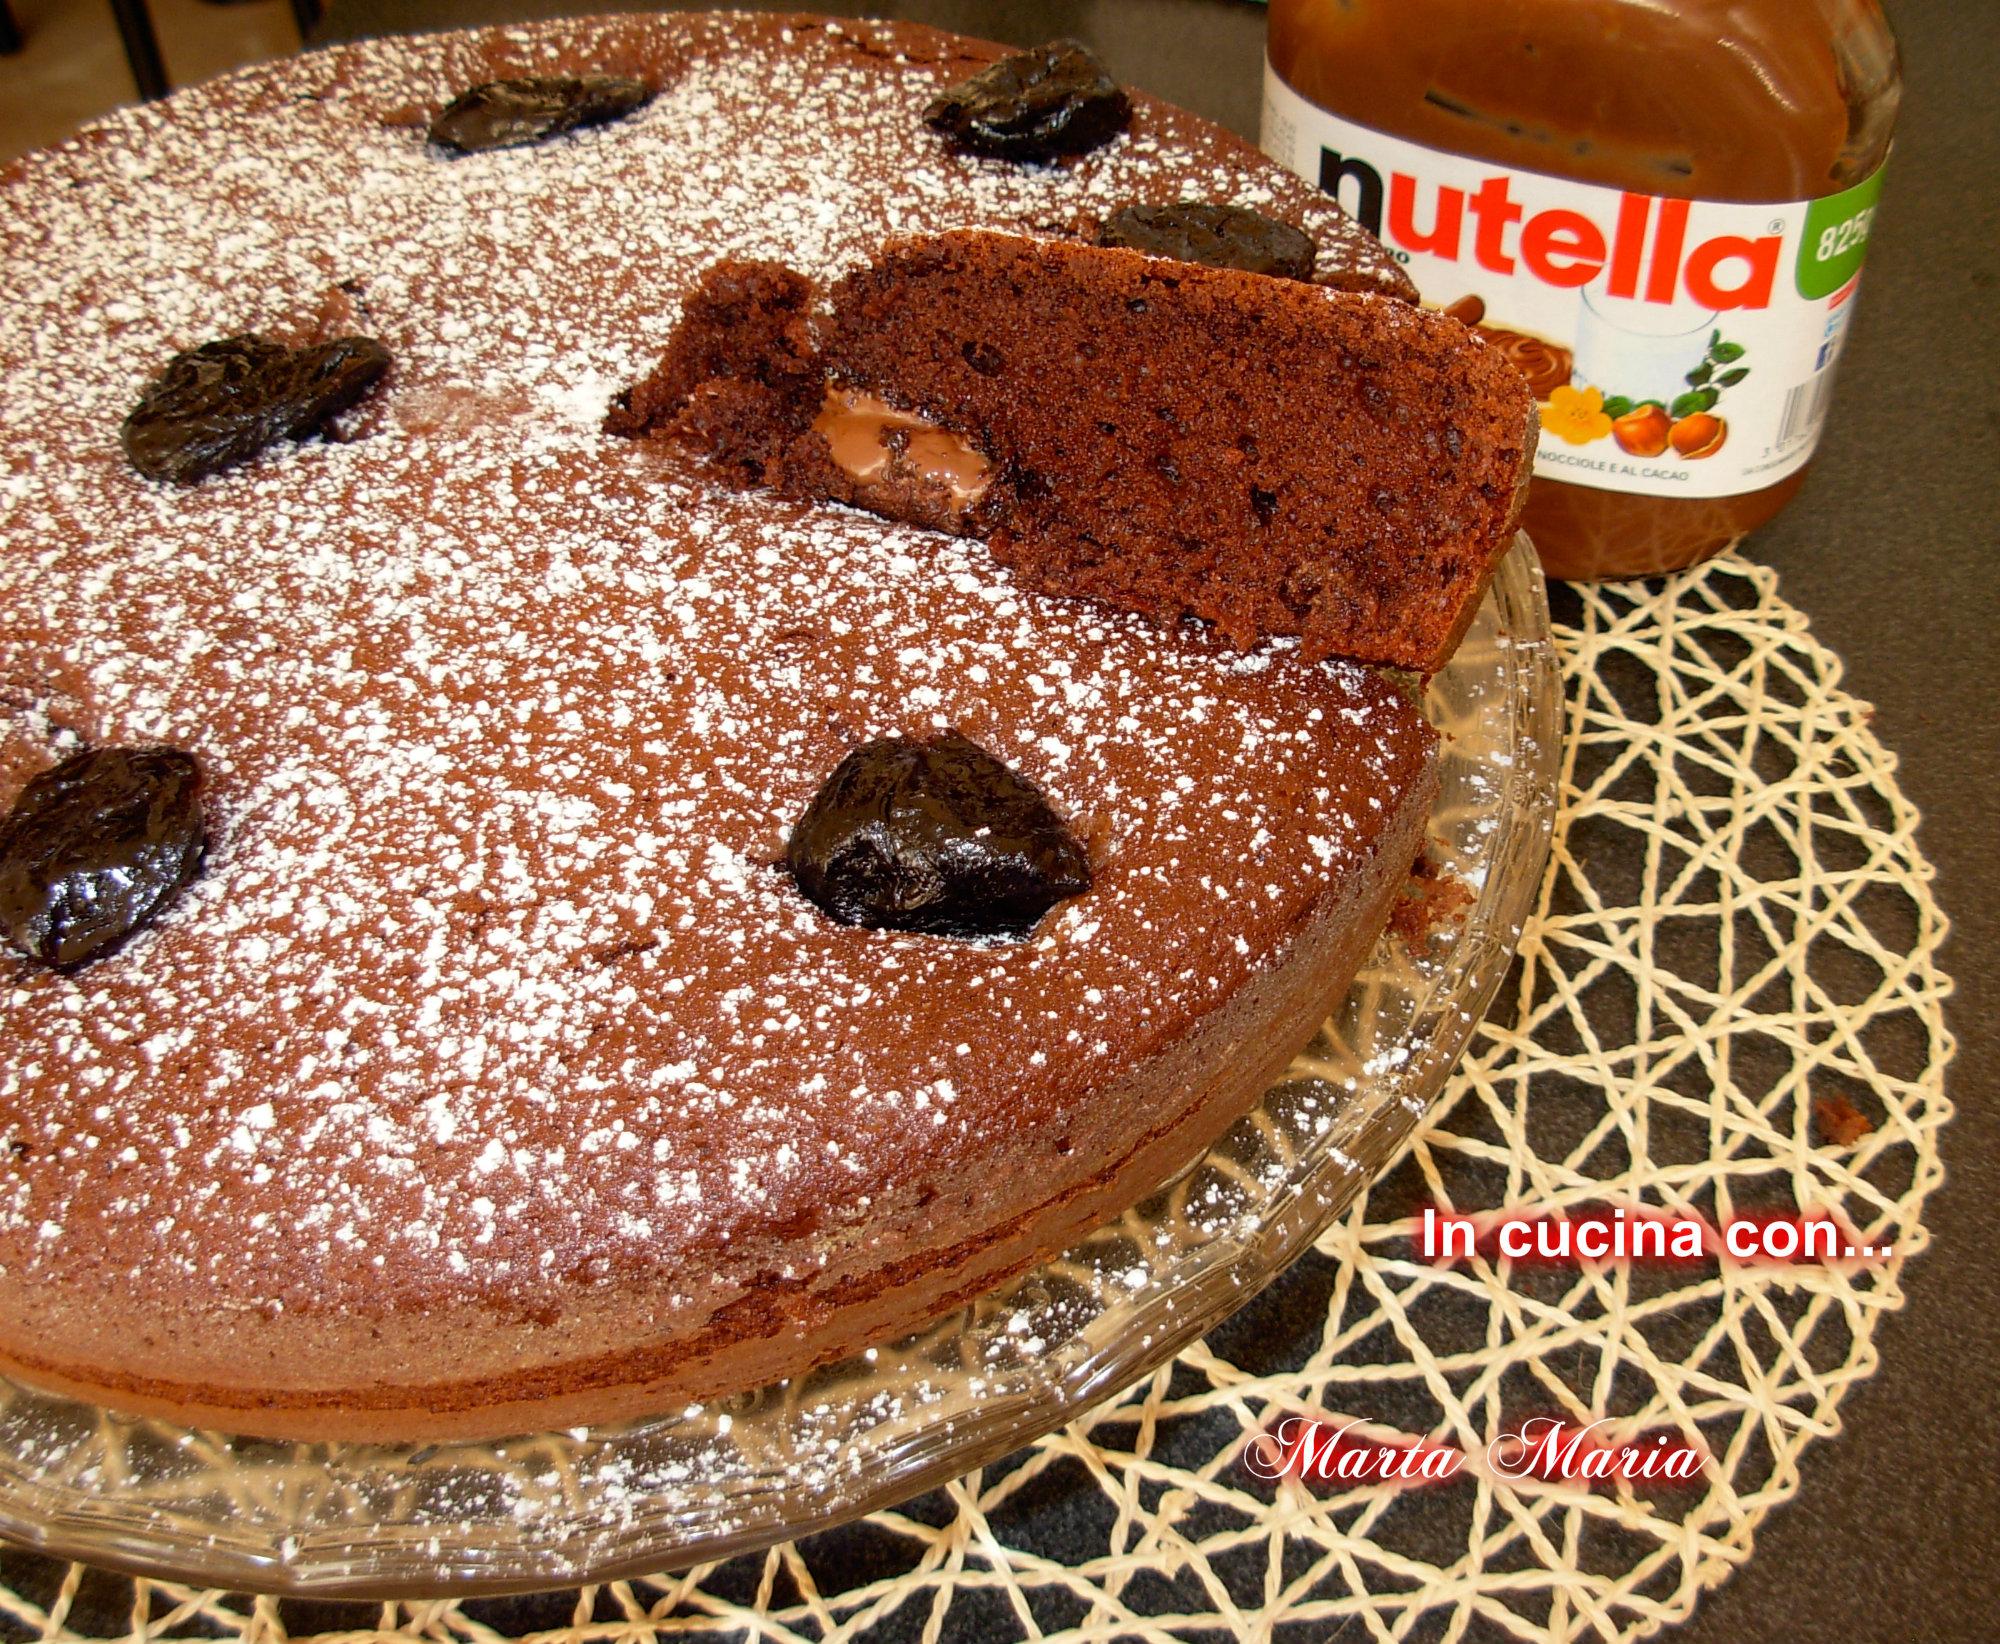 Ricetta Torta Estasi Alla Nutella.Torta Estasi Alla Nutella Ricetta Bimby In Cucina Con Marta Maria